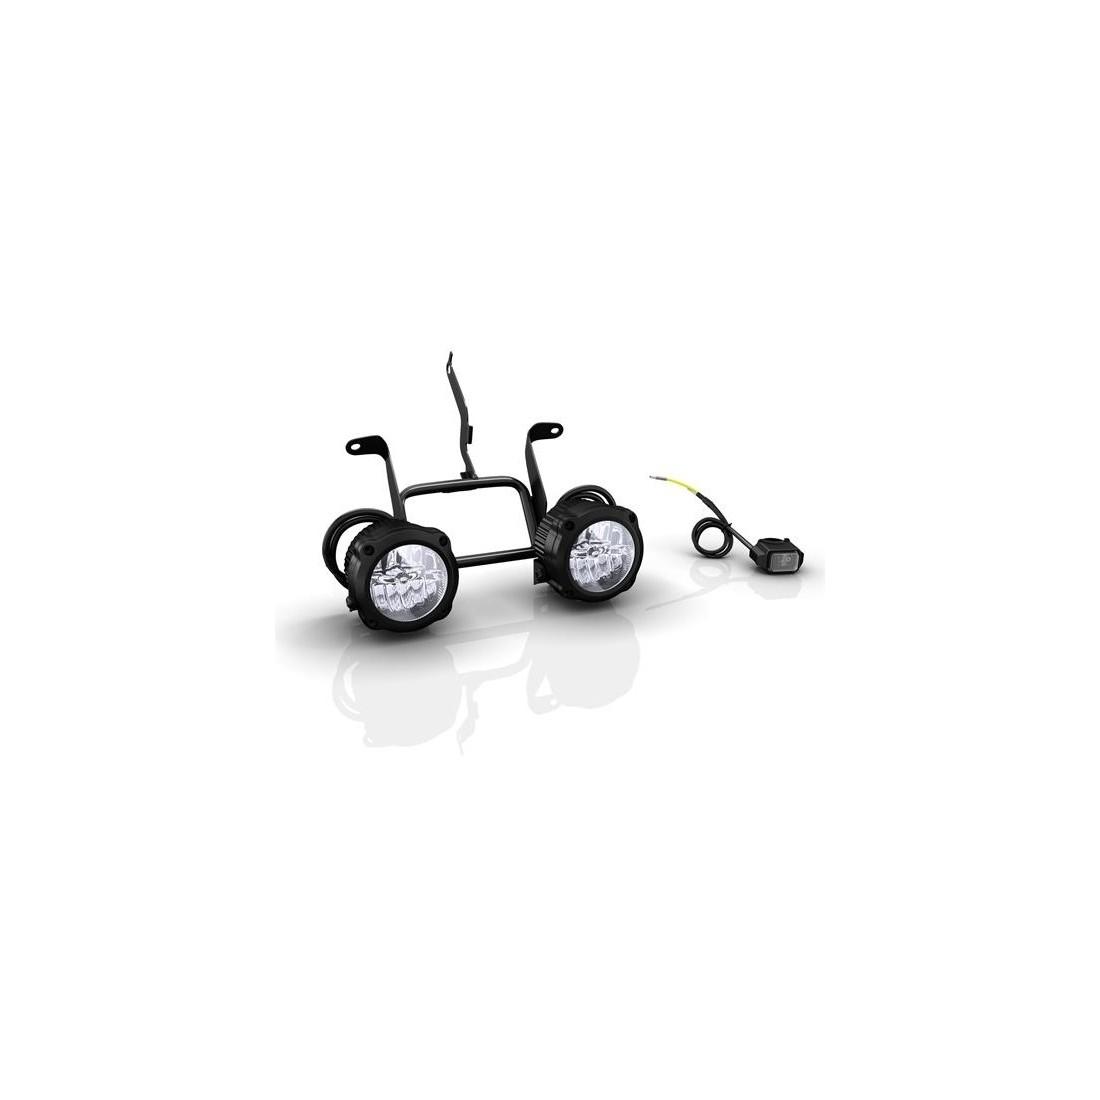 Kit Faros Antiniebla LED Yamaha Tracer 900 15-17